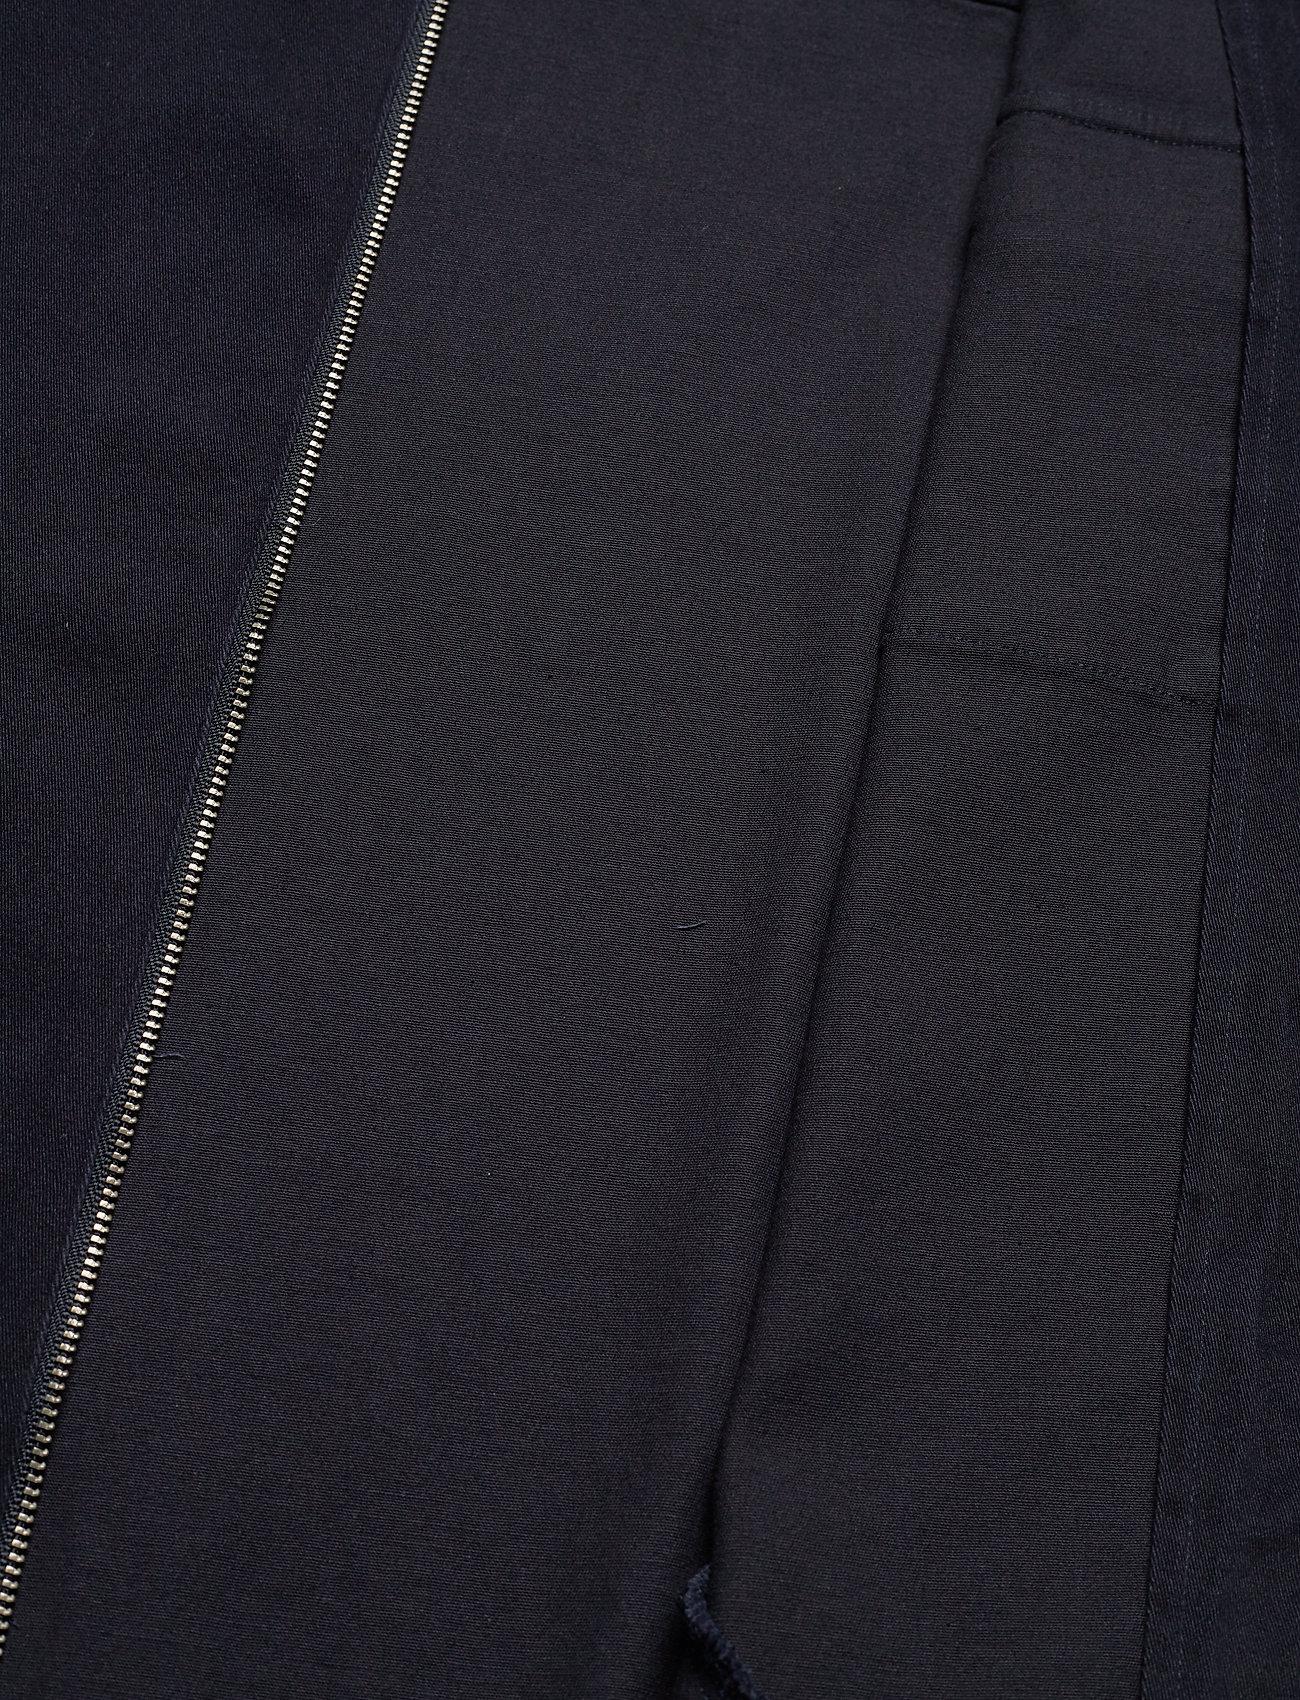 Twill Overshirt (Dark Navy) (54 €) - Lyle & Scott dQl5O